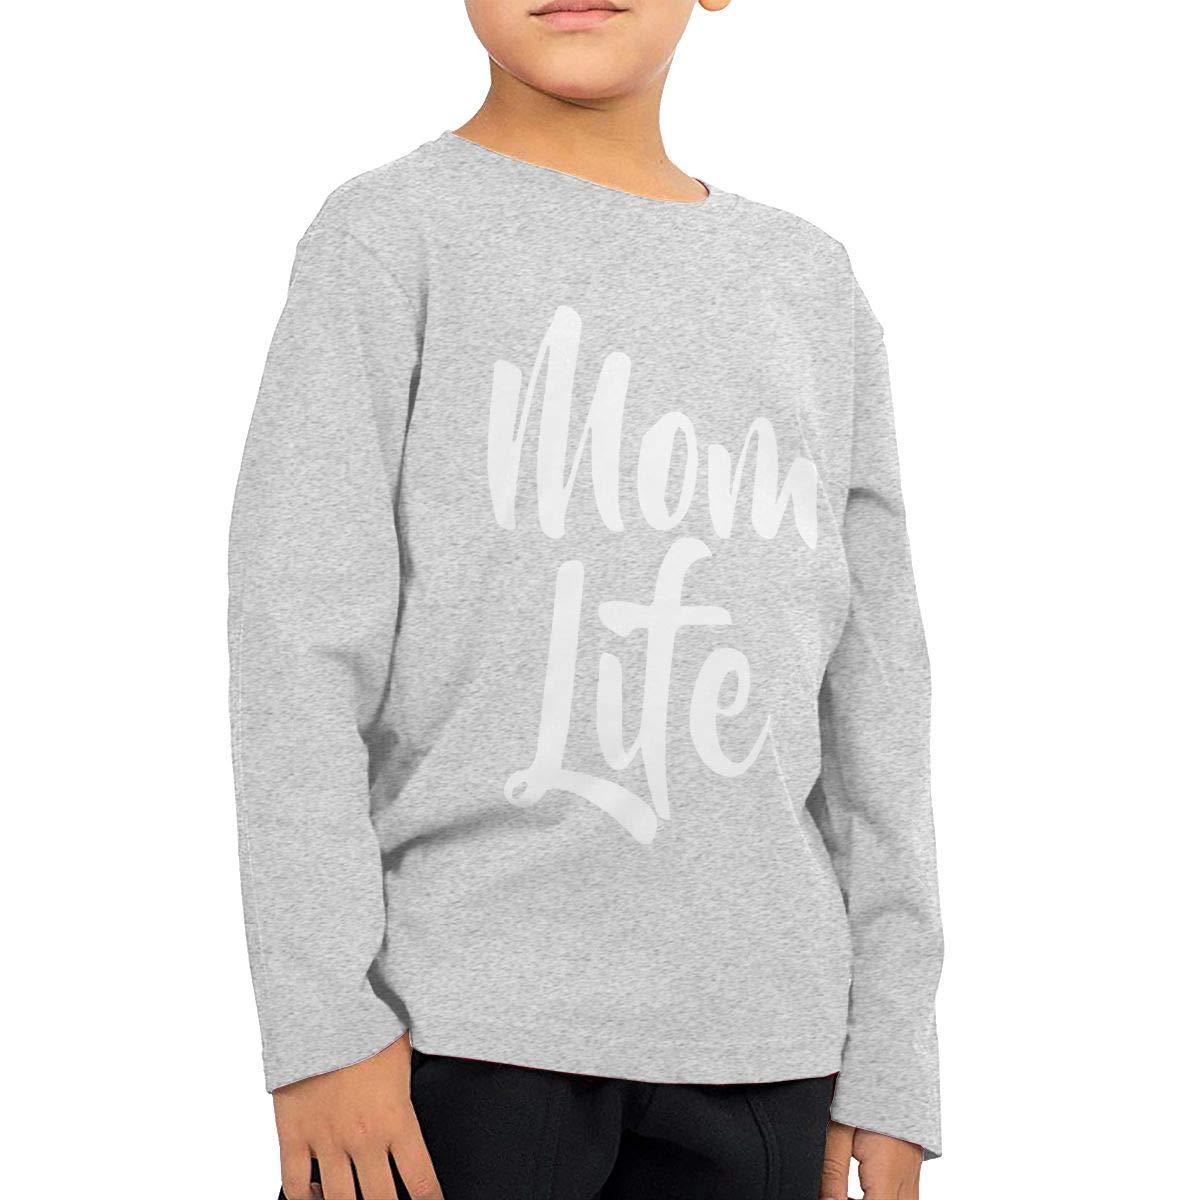 WCHUNMU Mom Life Childrens Cotton Gray Long Sleeve Round Neck Boys Or Girls T-Shirt